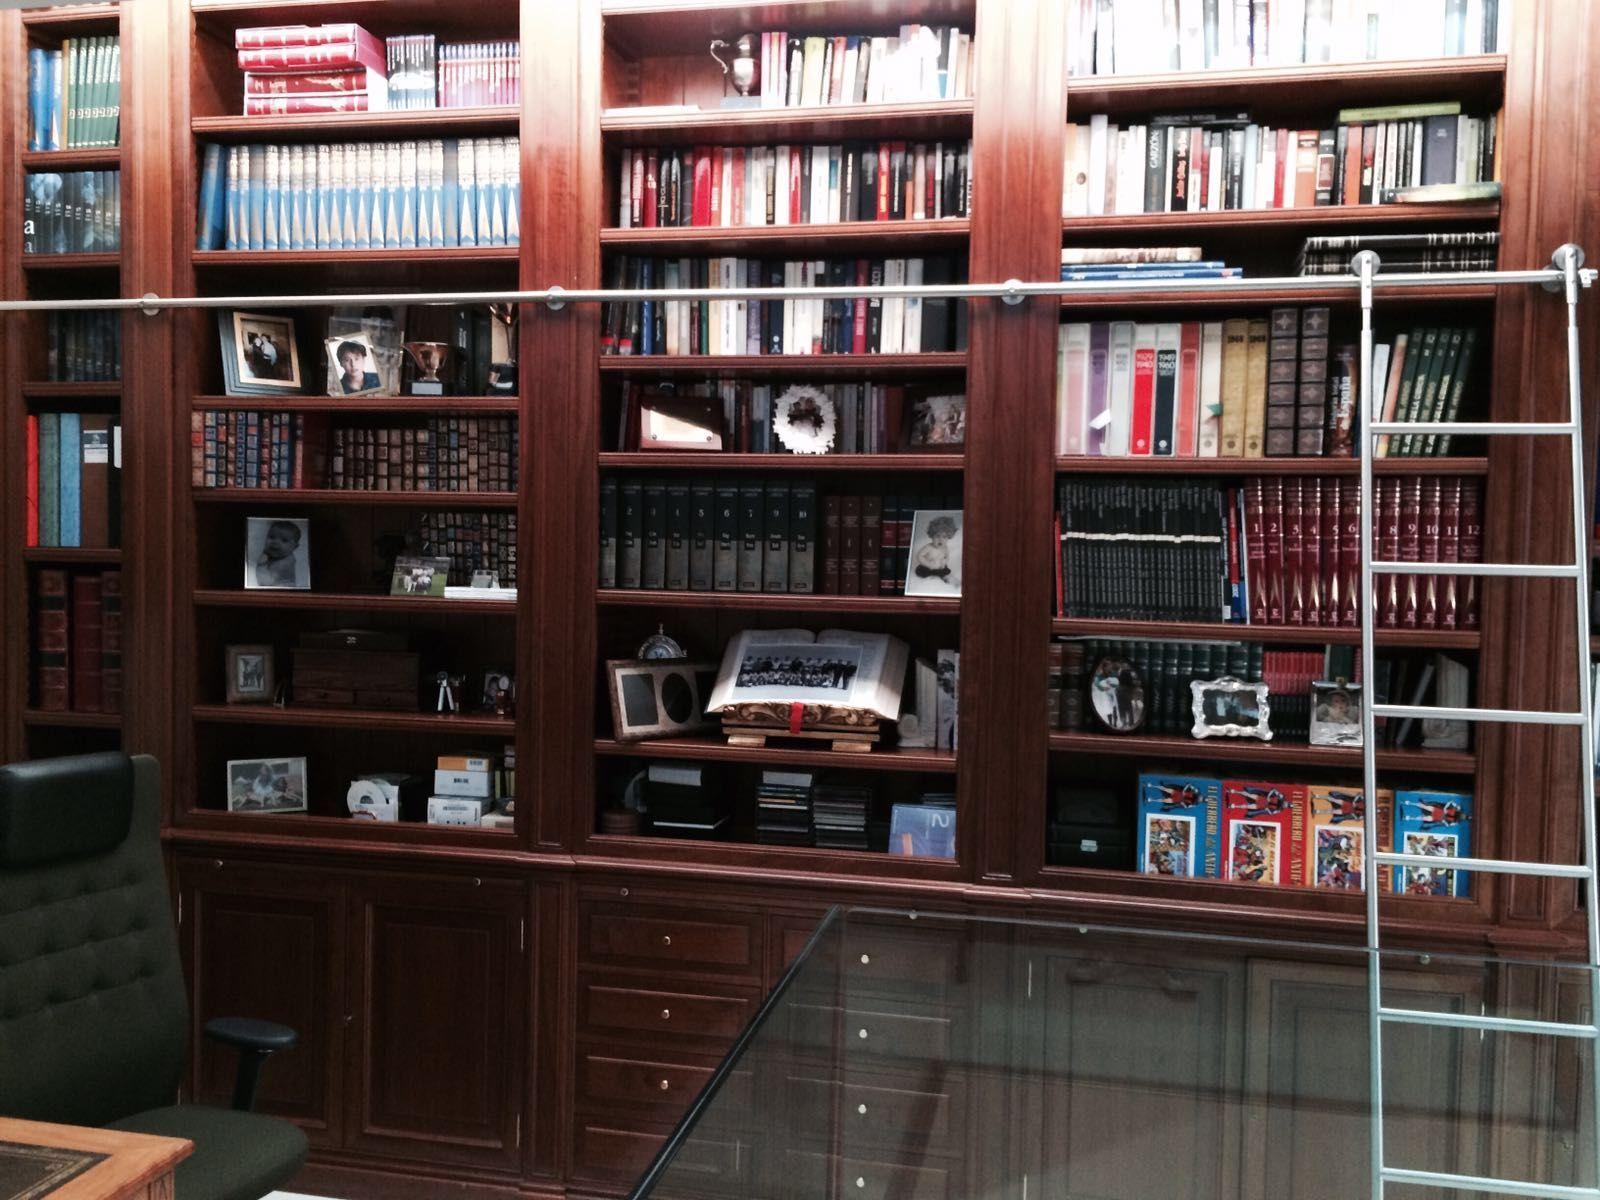 Muebles a medida: Catálogo de muebles de Gompar